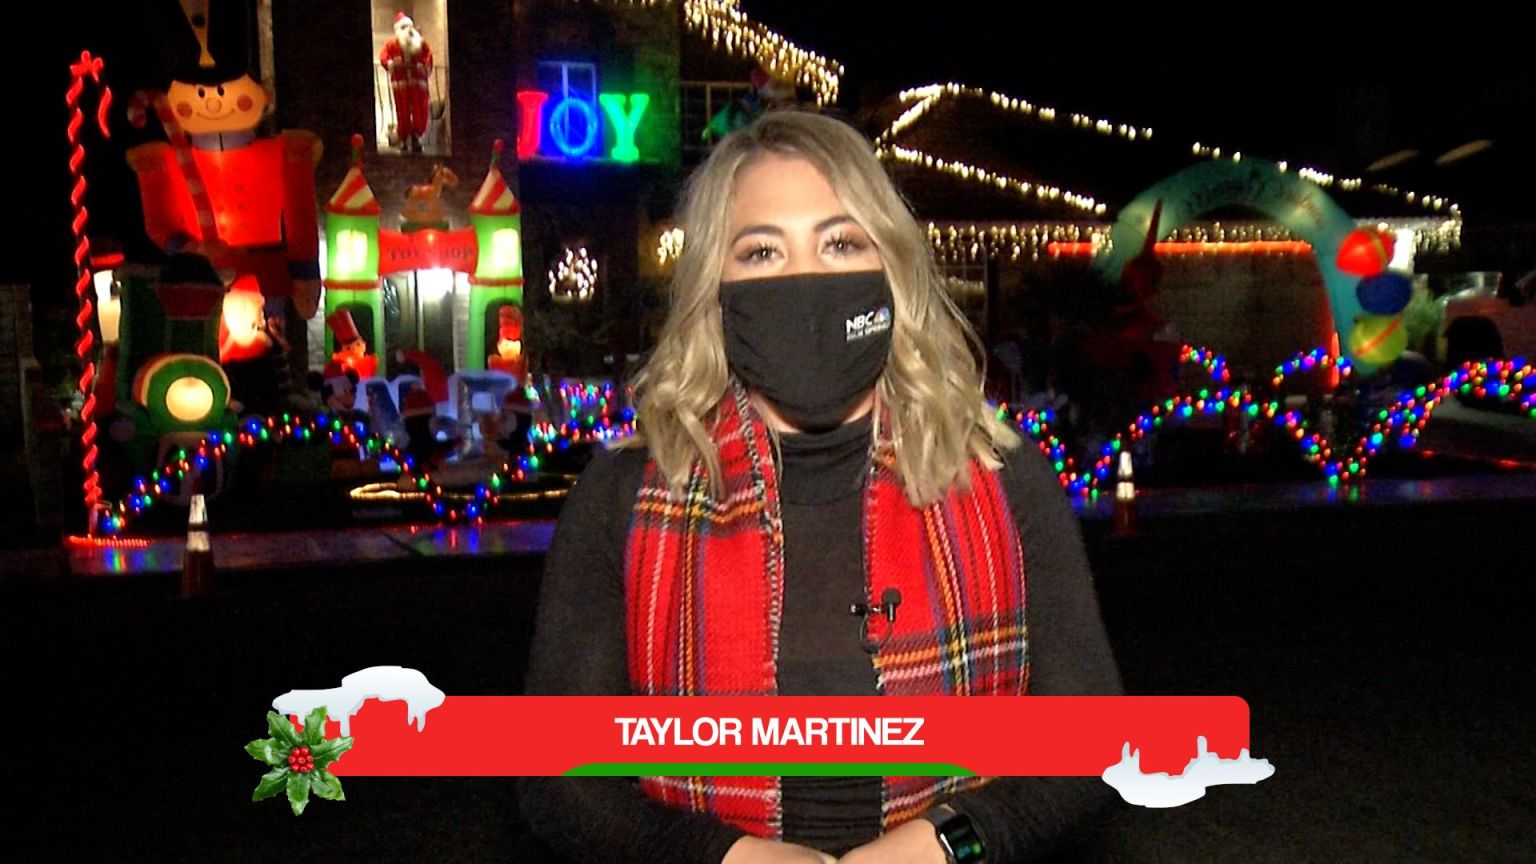 Weekly Rundown: A Coachella Valley Christmas